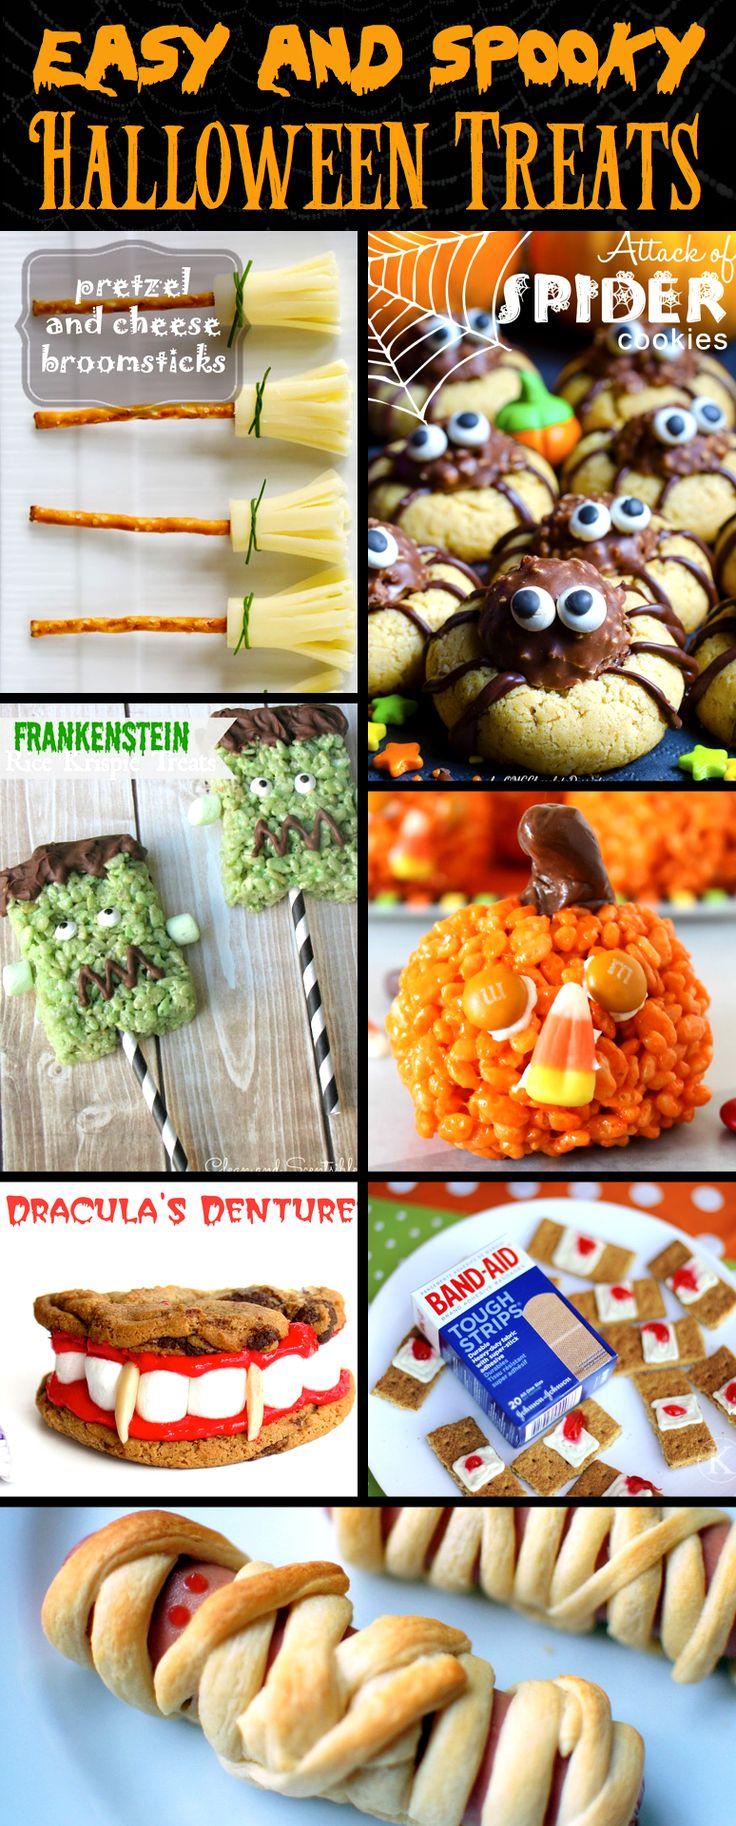 Best 25+ Halloween apps ideas on Pinterest | Halloween appetizers ...